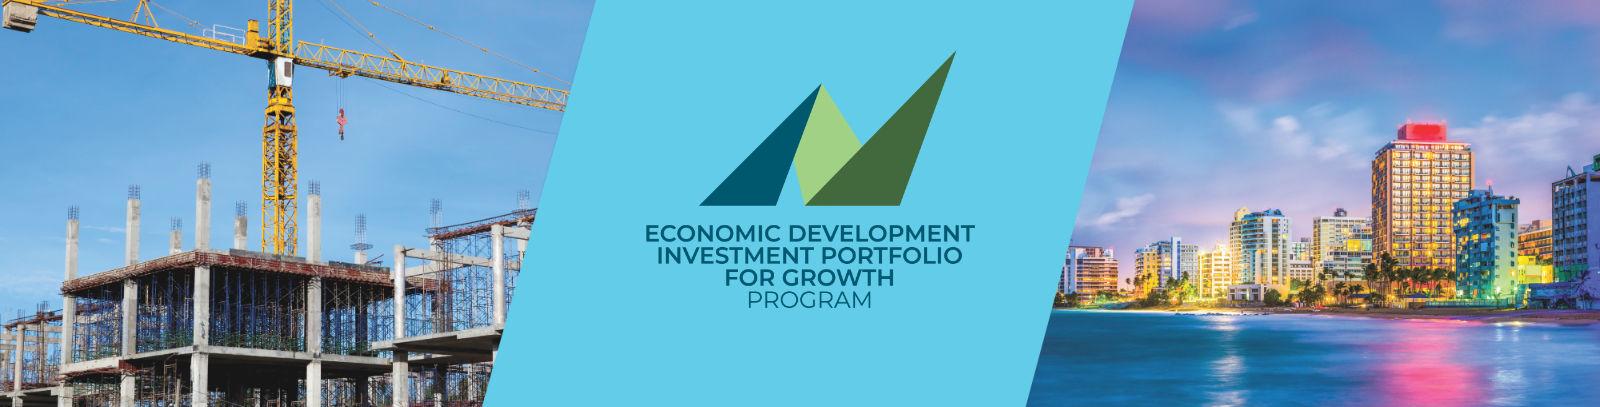 Investment Portfolio for Growth (IPG) Program